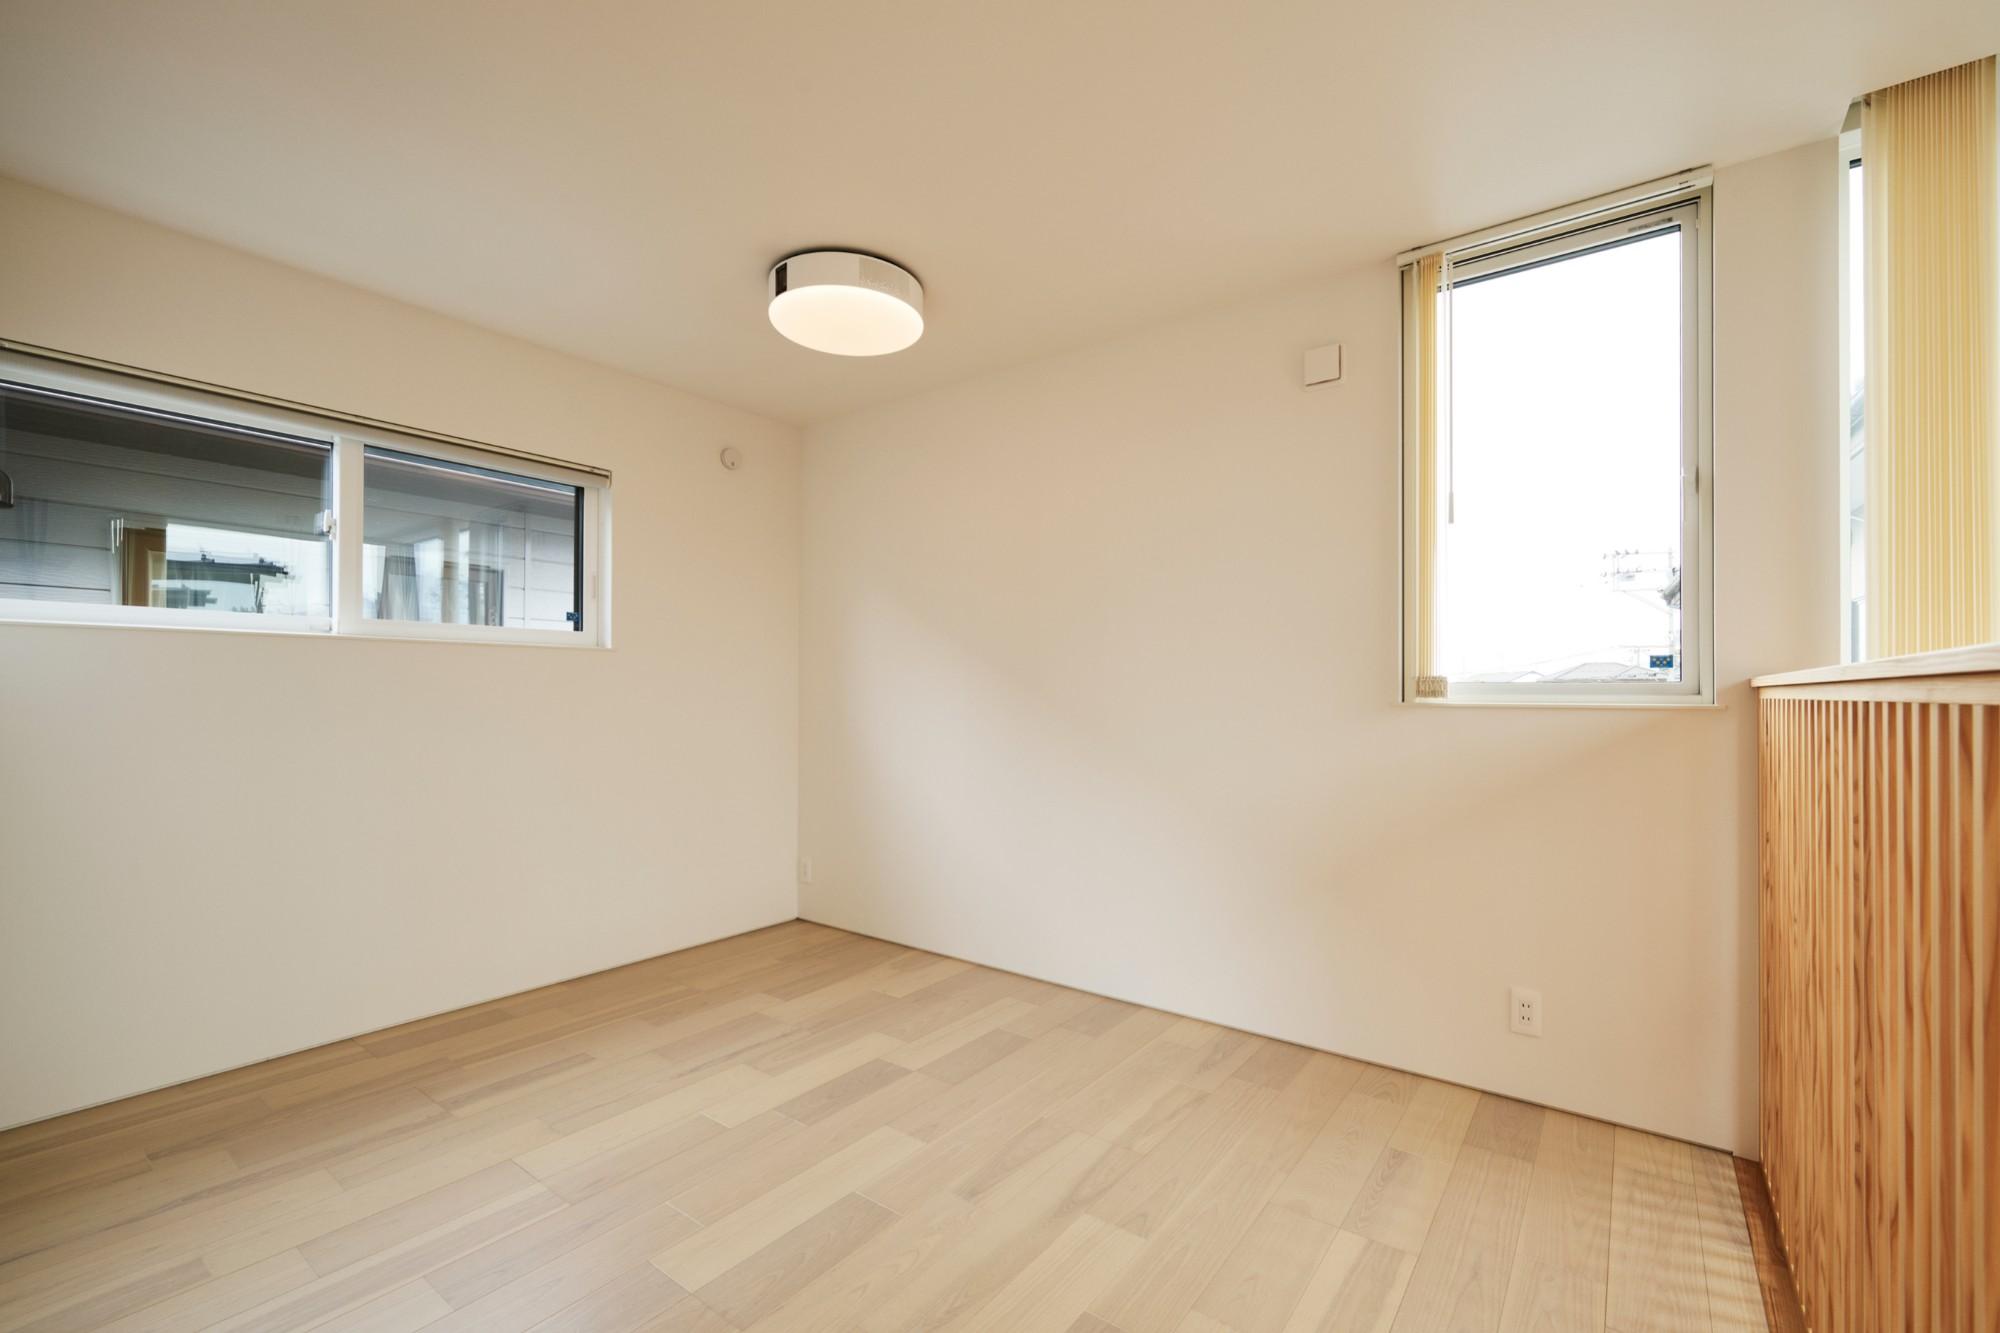 DETAIL HOME(ディテールホーム)「コンパクトにデザインする家」のシンプル・ナチュラルな居室の実例写真